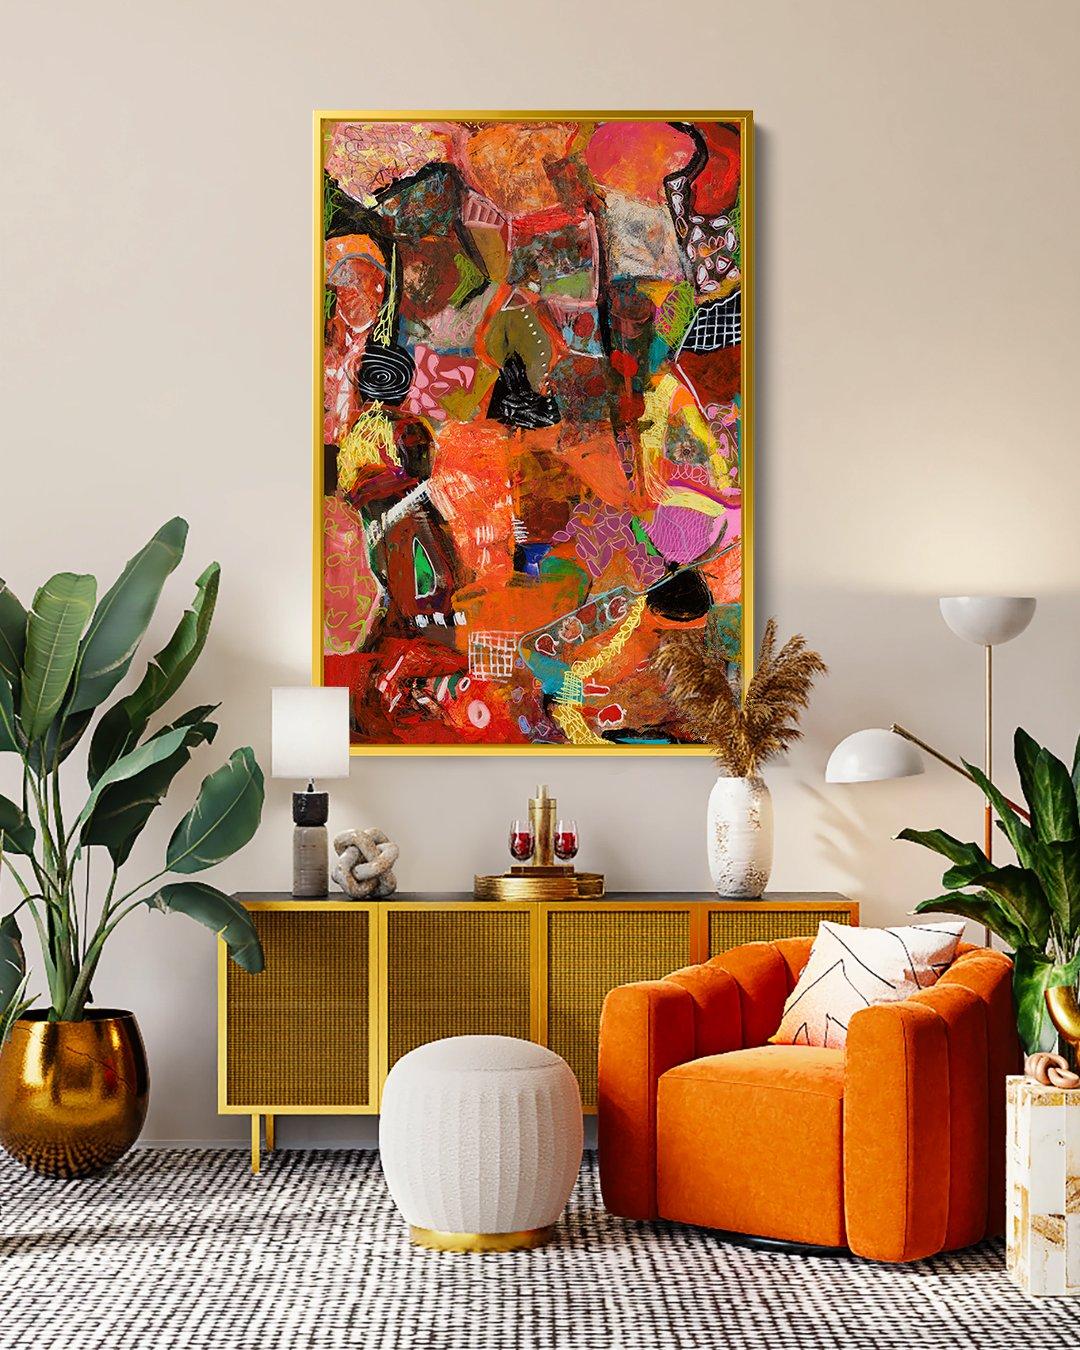 Abstract art in interior decor inspiration, Wall art, Modern painting, orange, vibrant